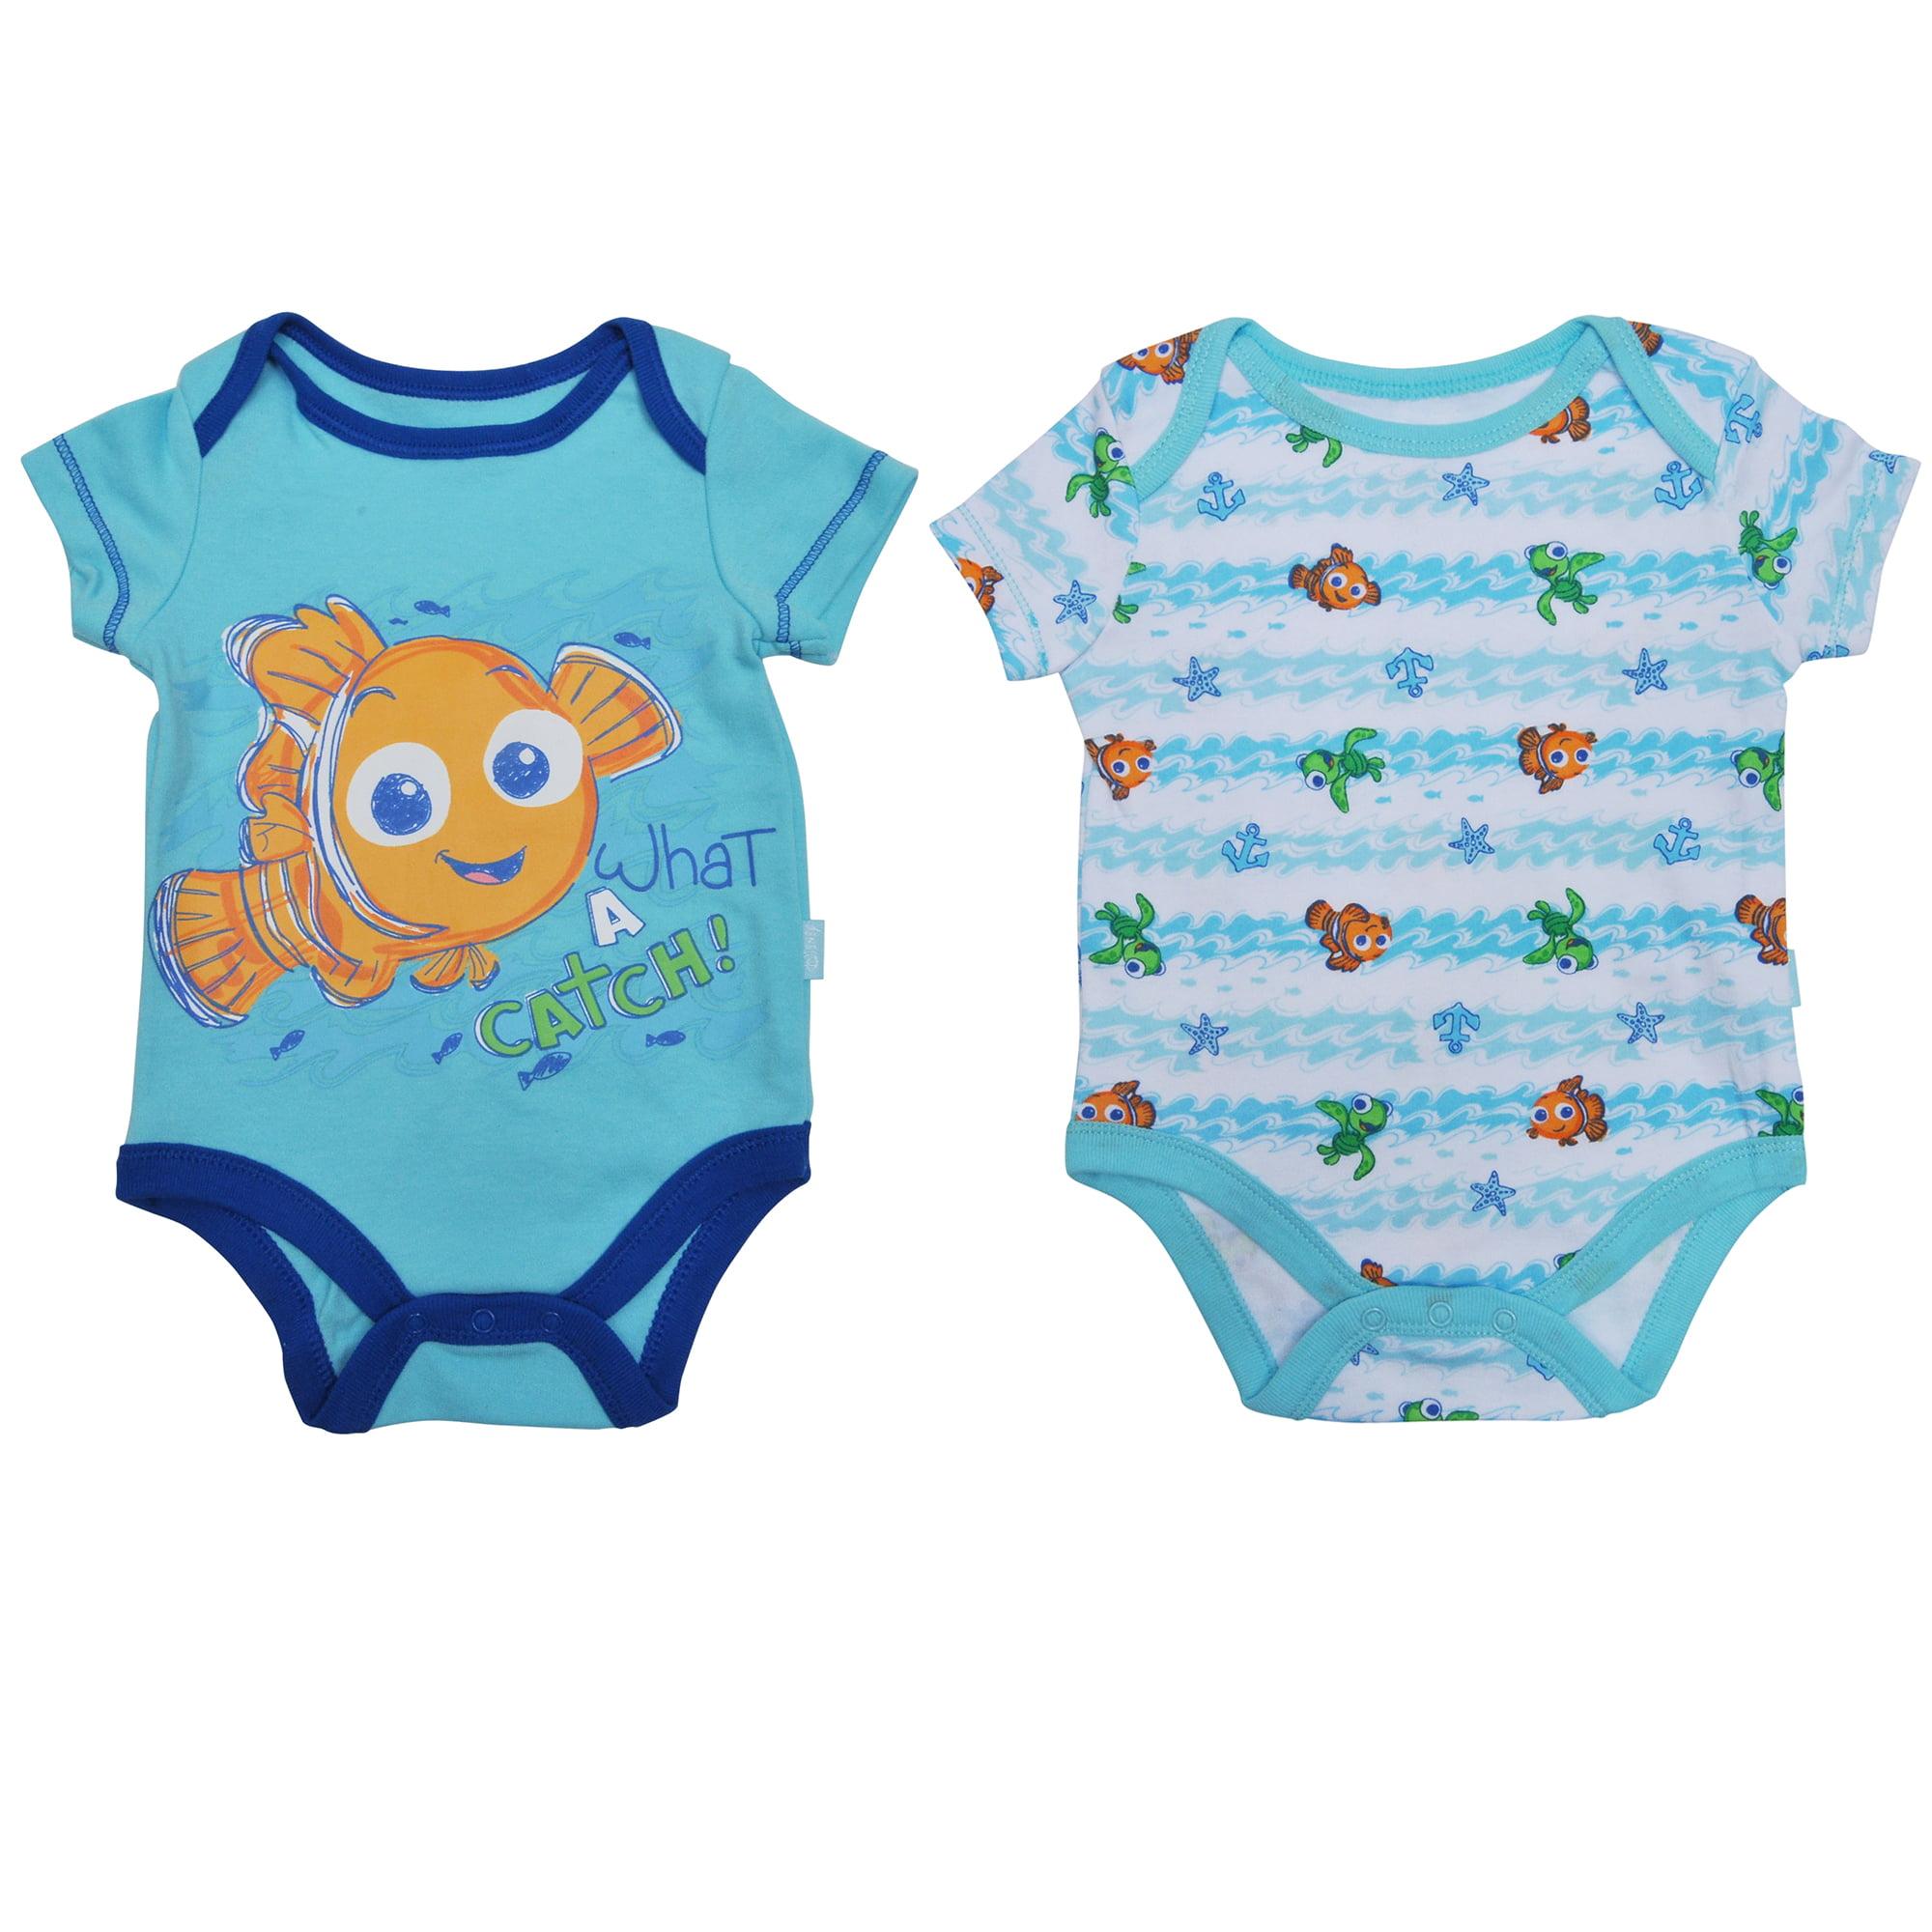 1f9be0494 Disney - Disney Nemo Infant Baby Boys One-Piece Bodysuits 2-Pack ...